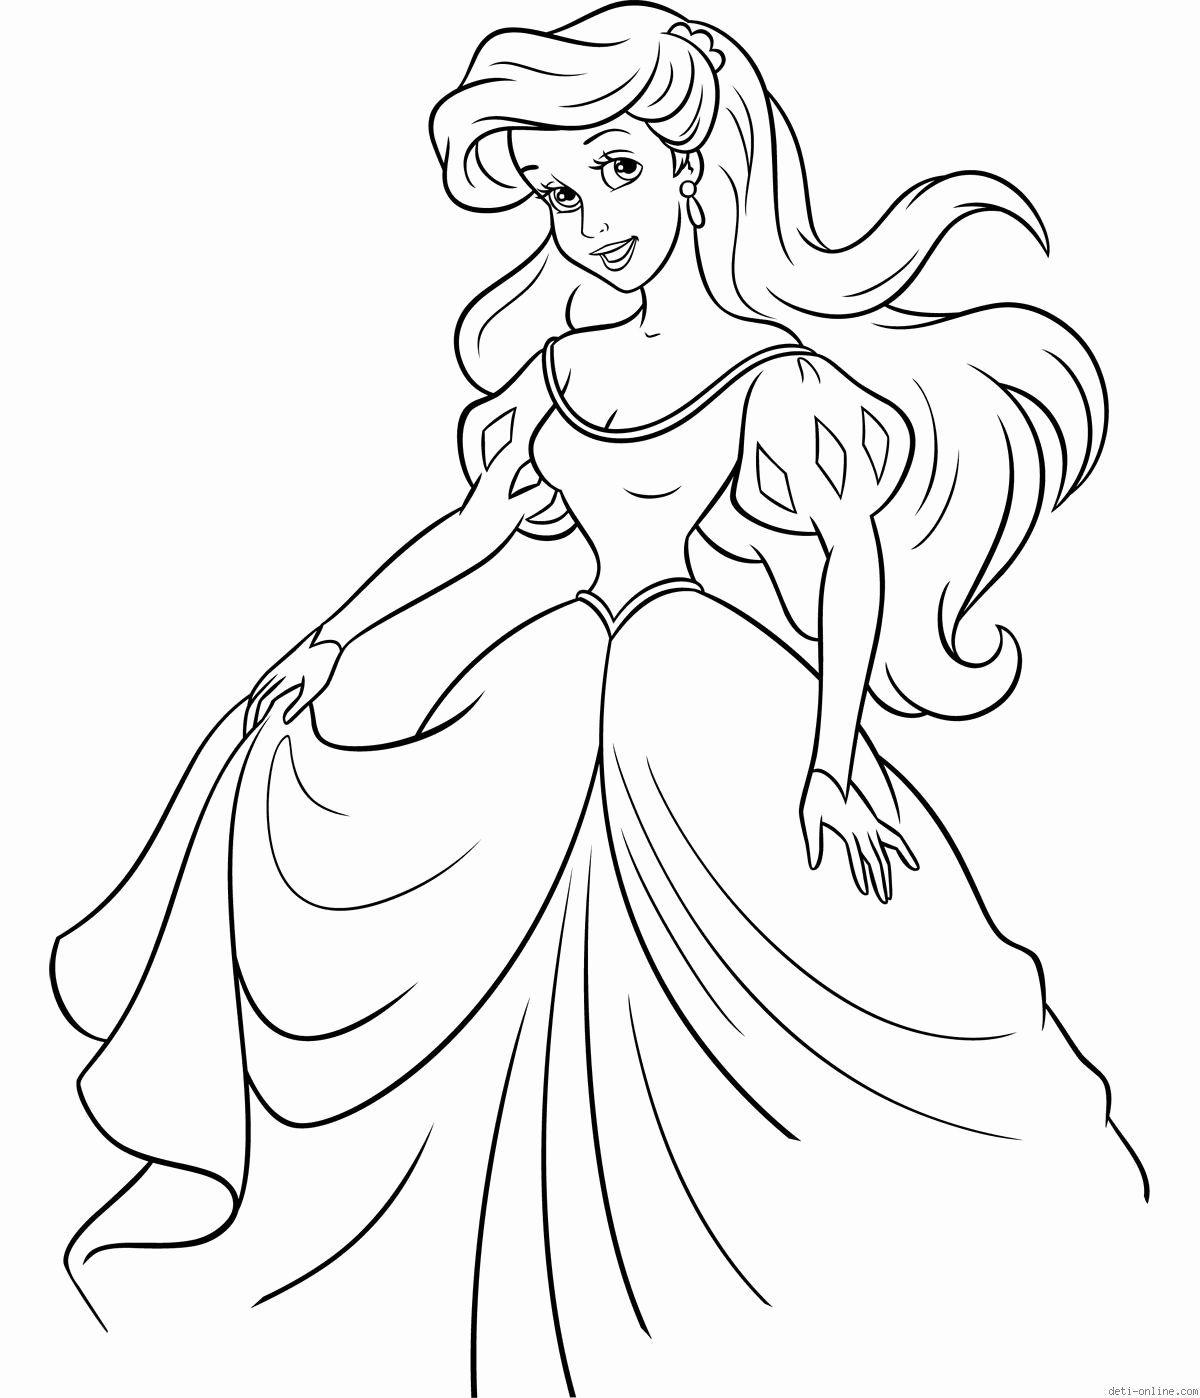 24 Little Mermaid Coloring Book Niceladiesnaughtybooks Com Mermaid Coloring Pages Princess Coloring Pages Ariel Coloring Pages